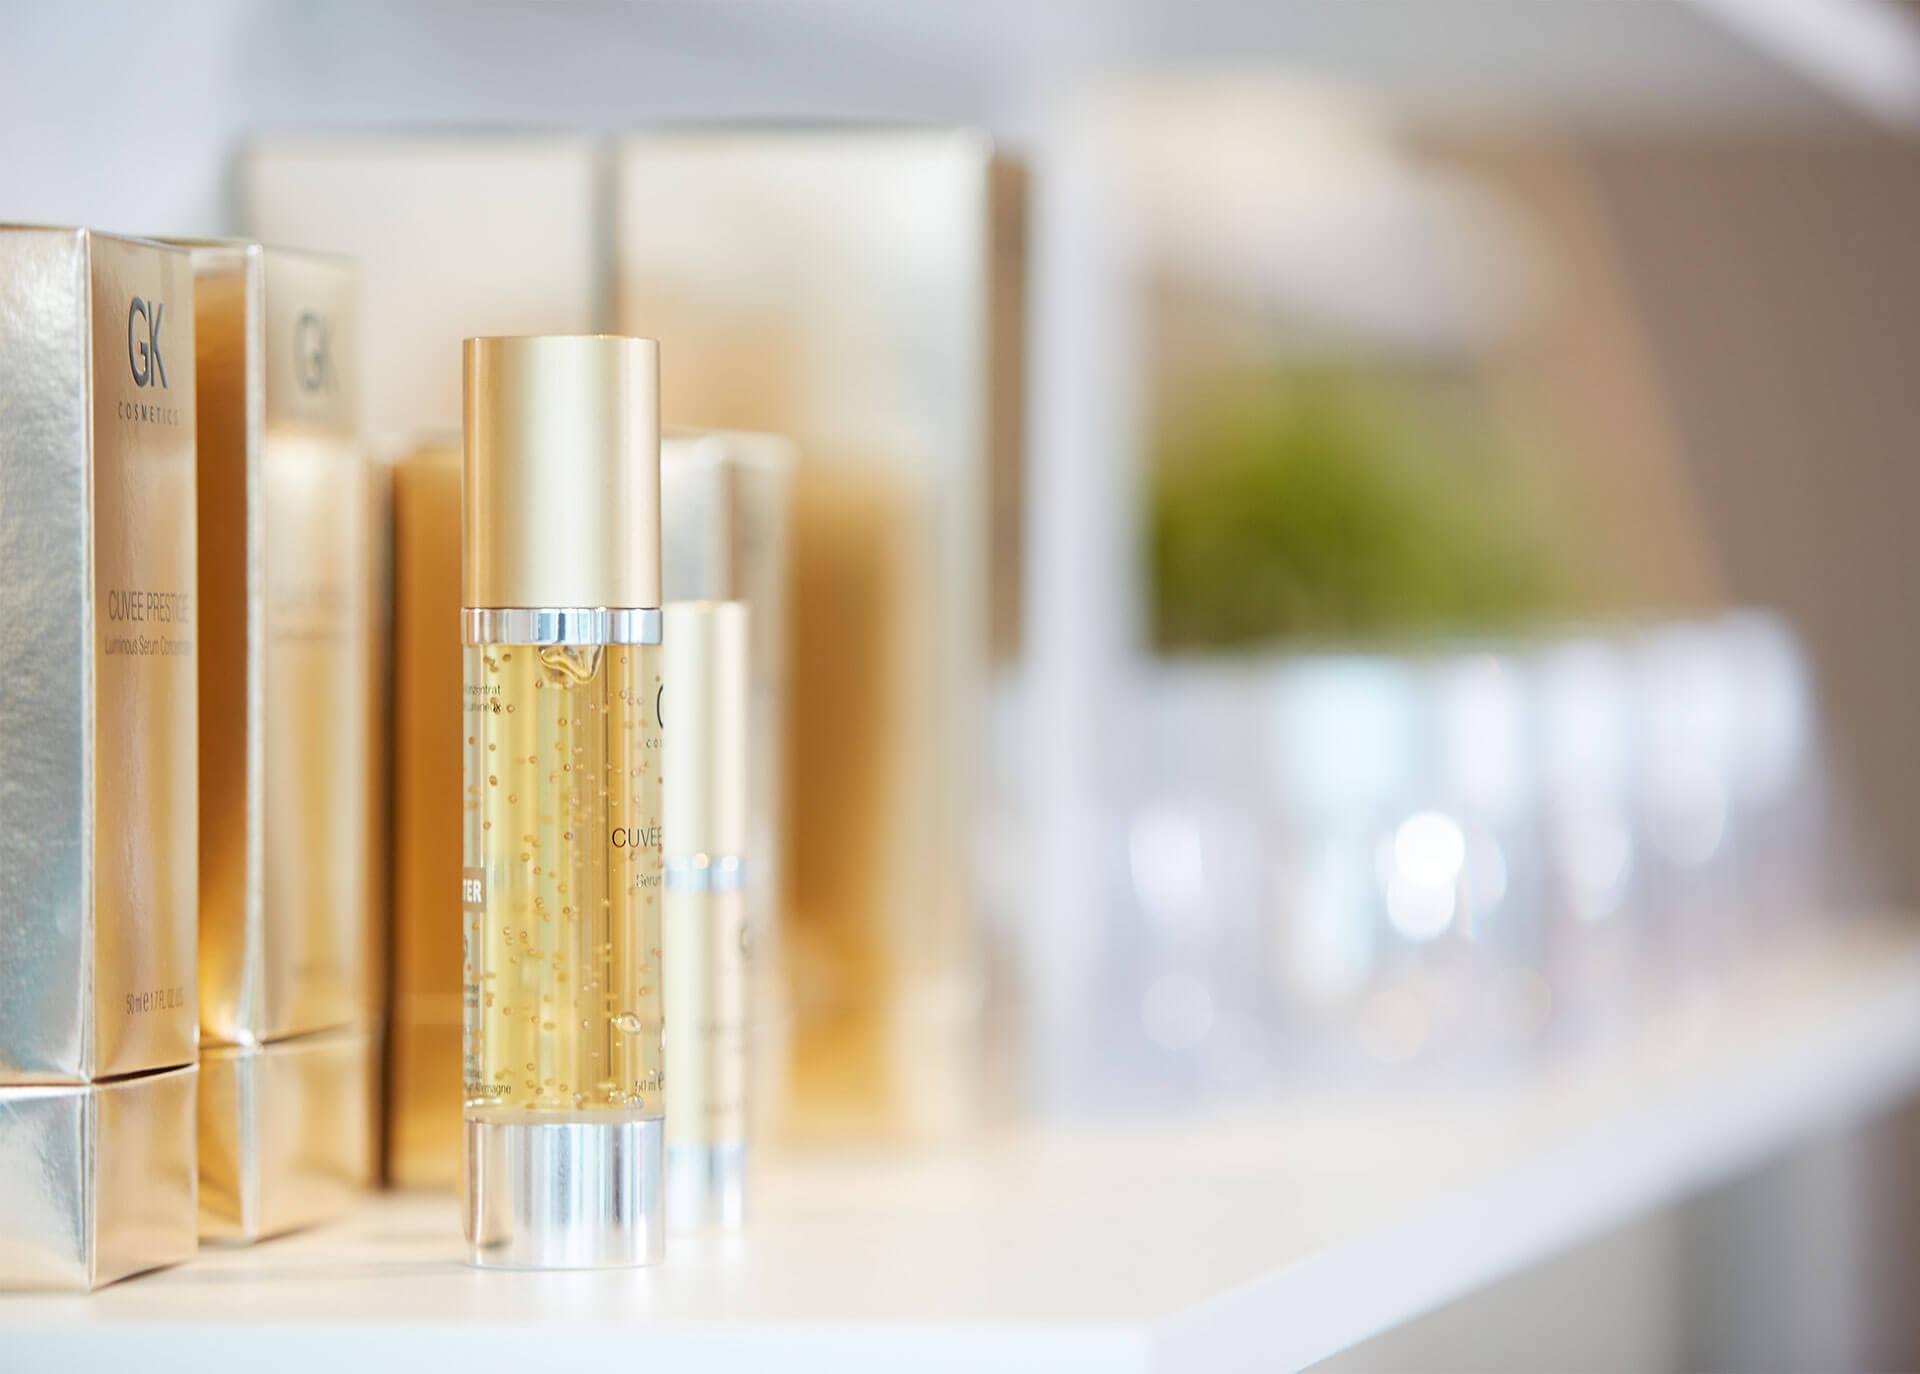 Produkte Bettendorf Kosmetik